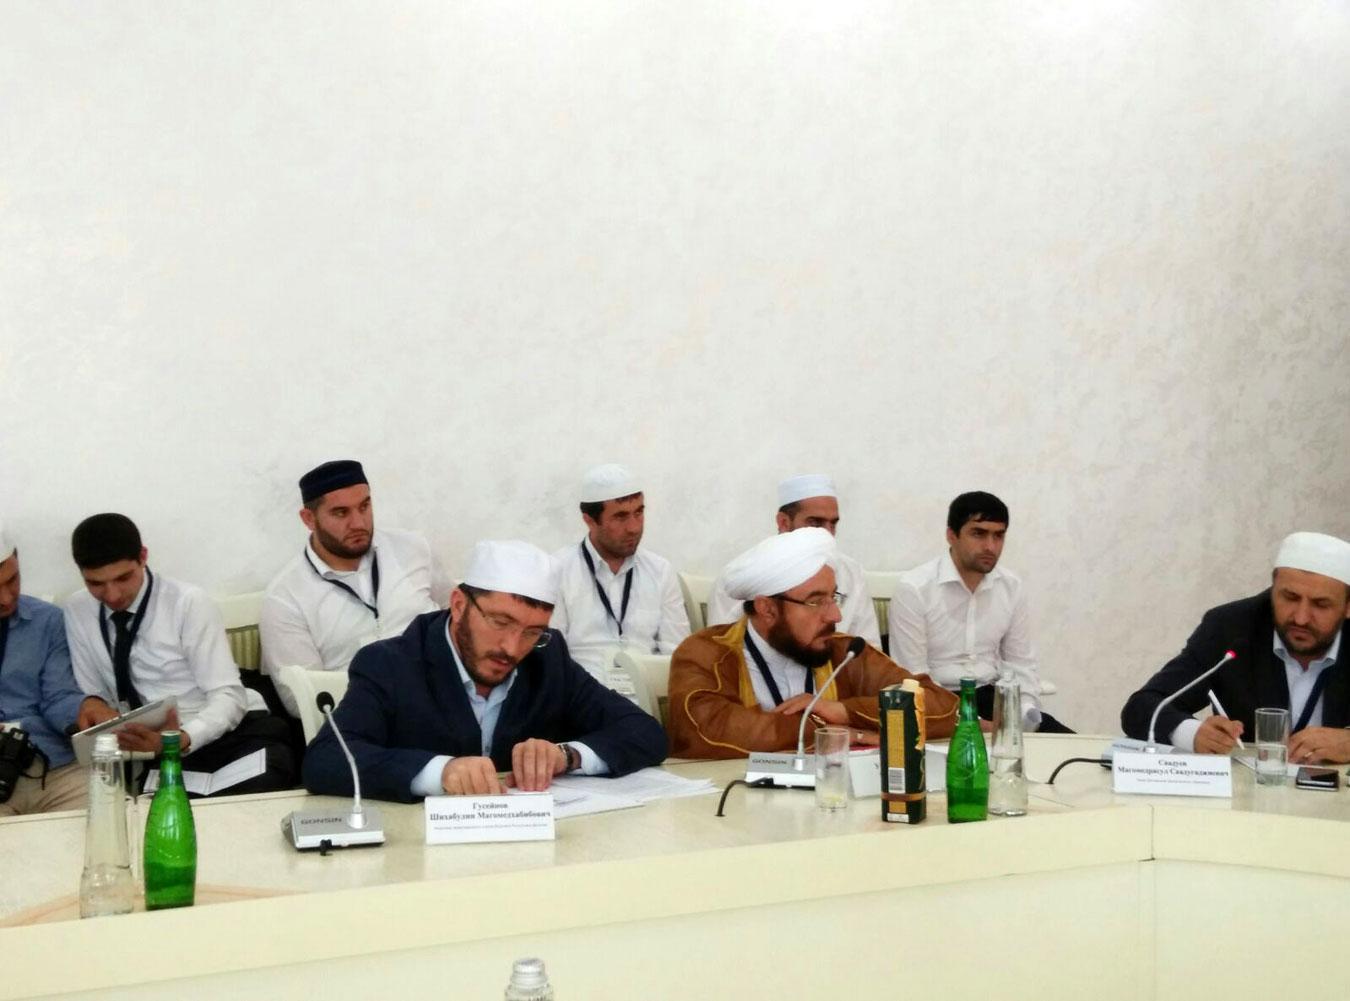 Киргизбаев абдурахим абдукадырович фото